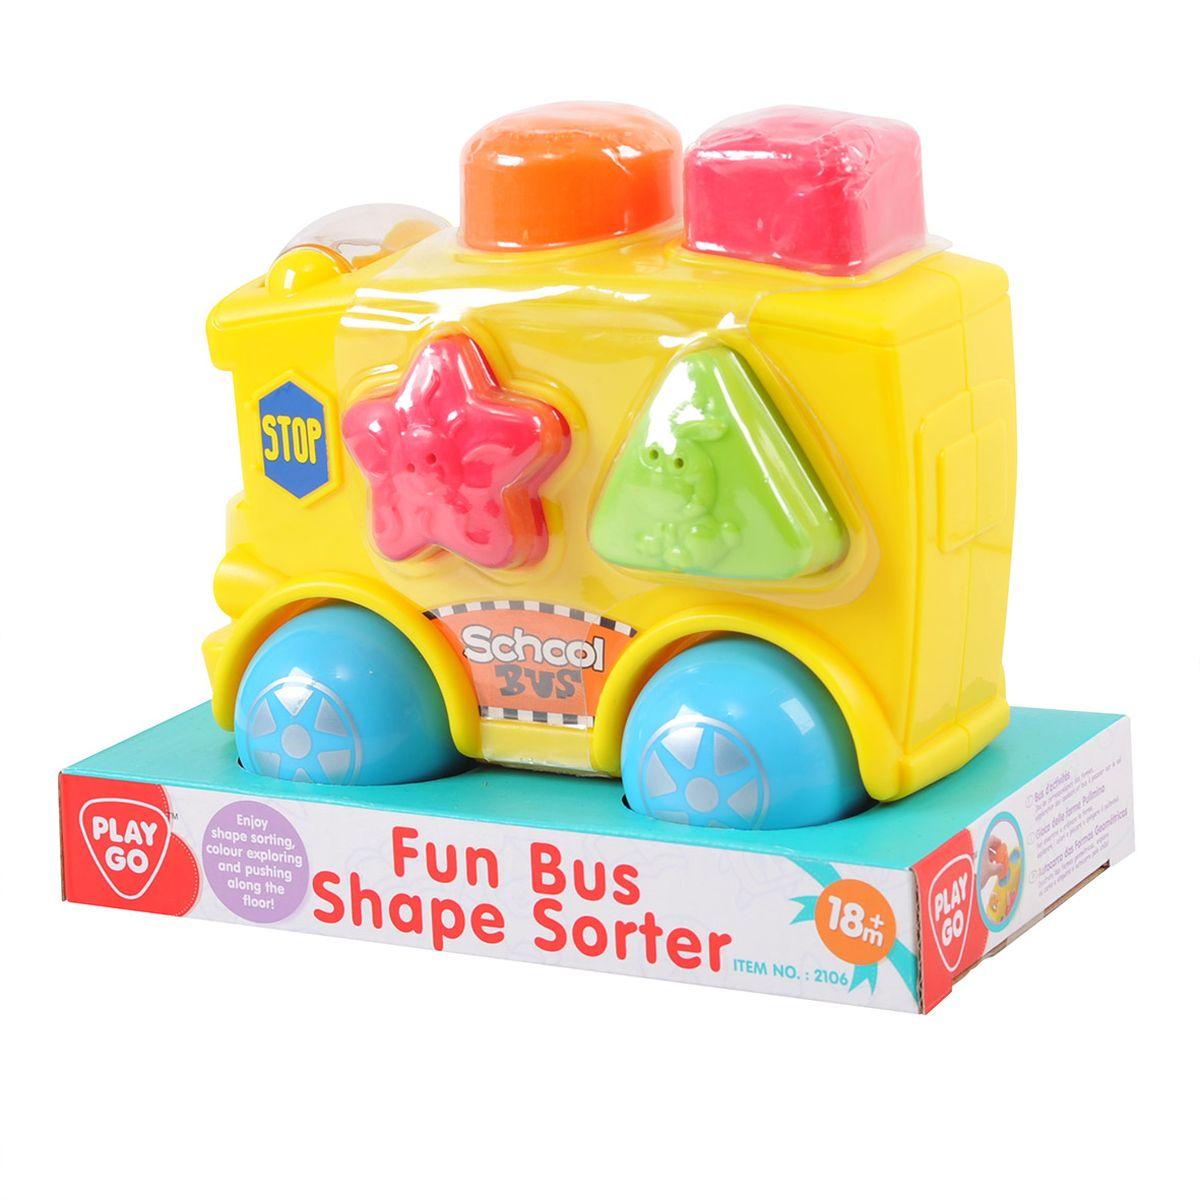 Playgo Развивающая игрушка Автобус-сортер сортеры playgo развивающая игрушка самолет сортер